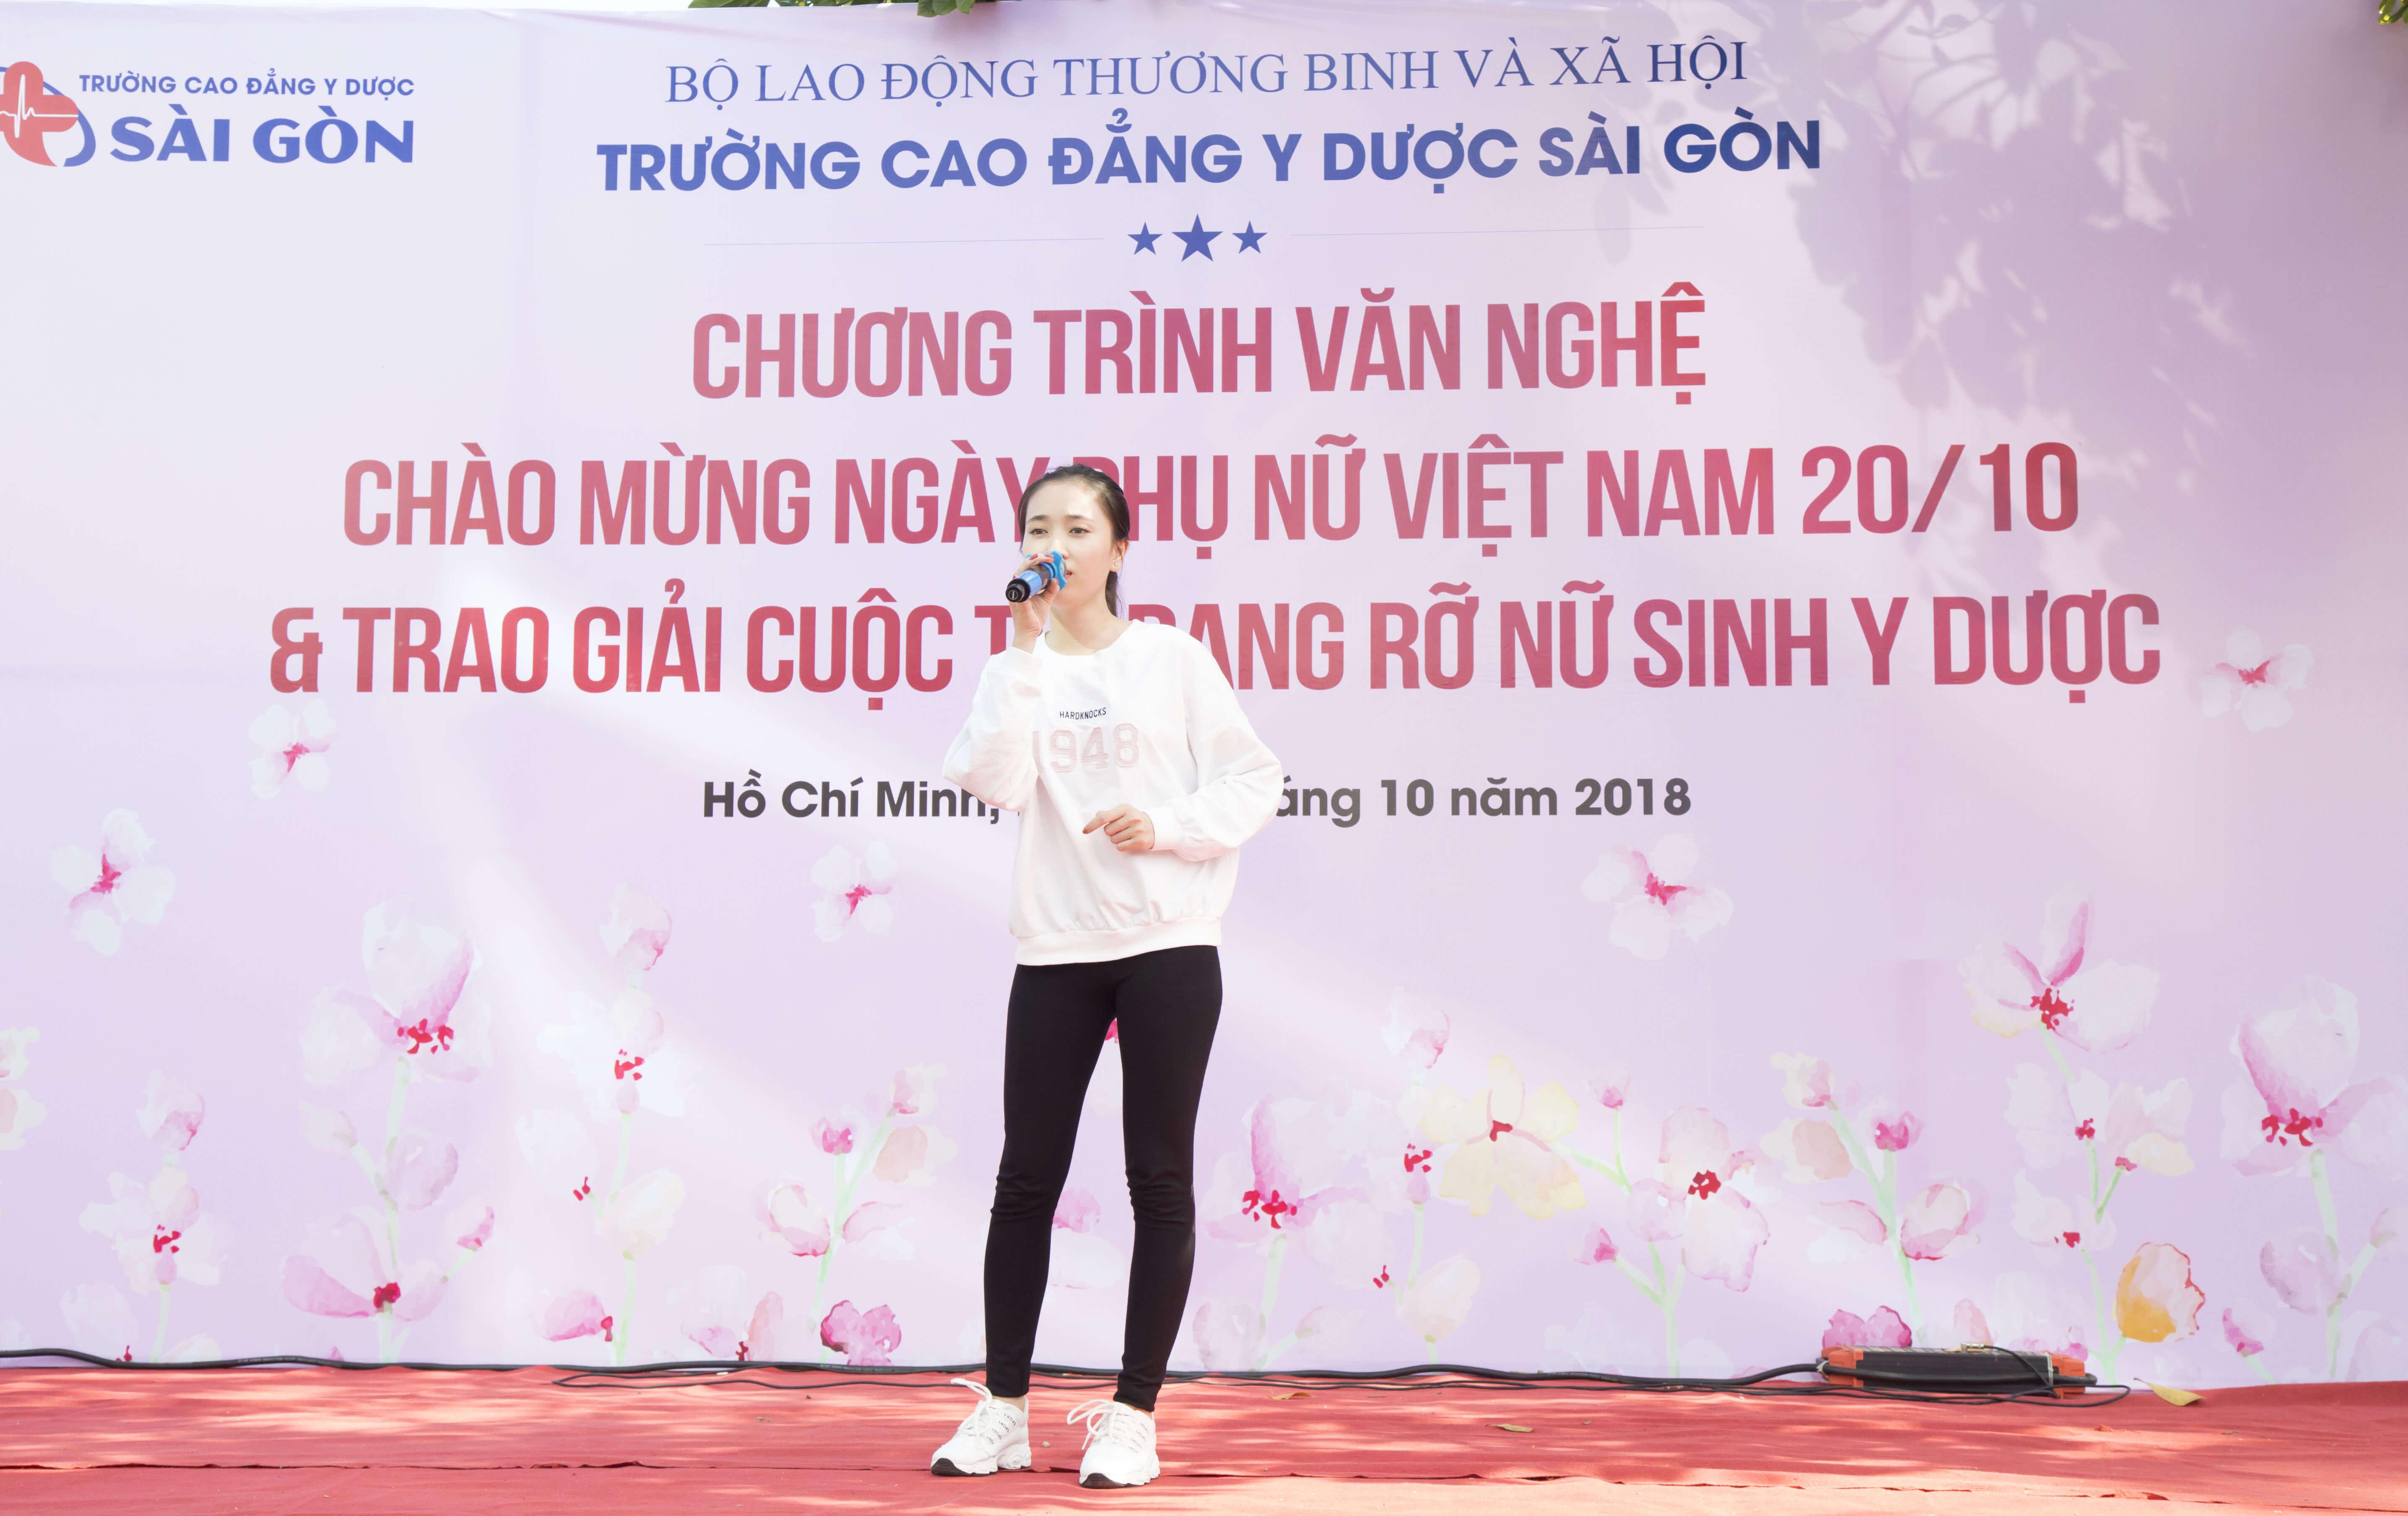 hoat-dong-sinh-vien-truong-cao-dang-y-duoc-sai-gon-tai-tphcm-61